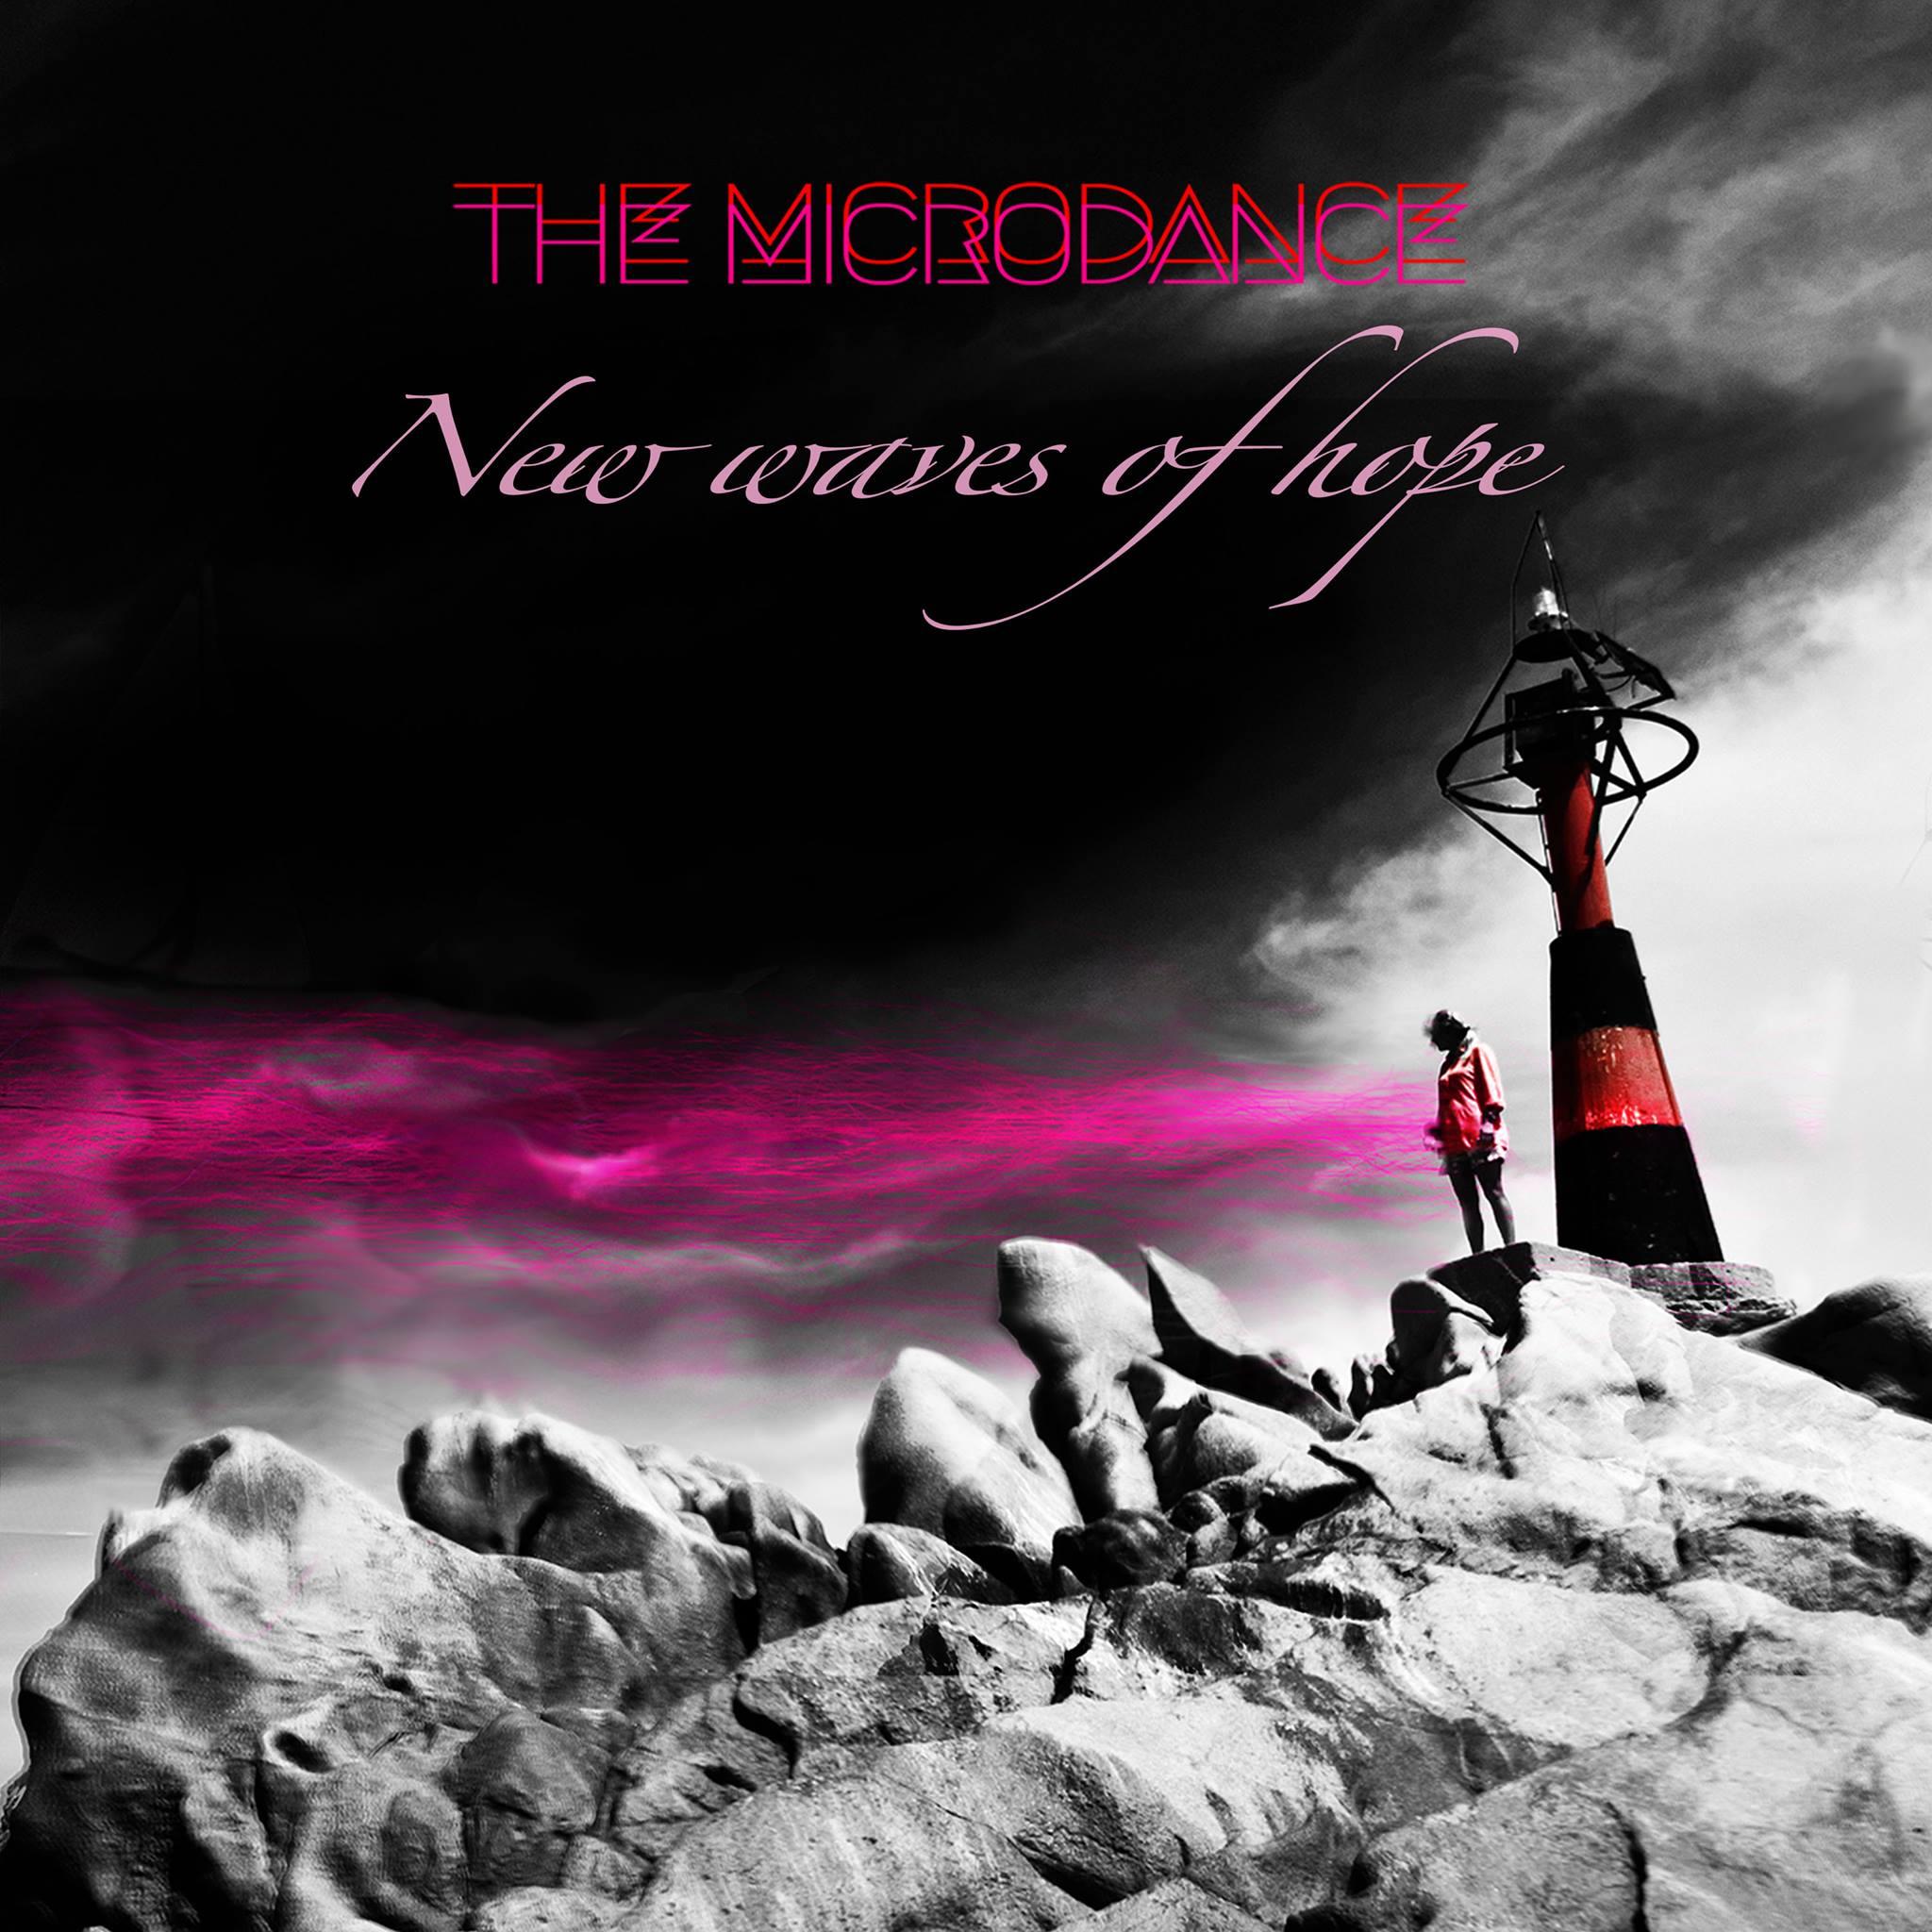 The Microdance